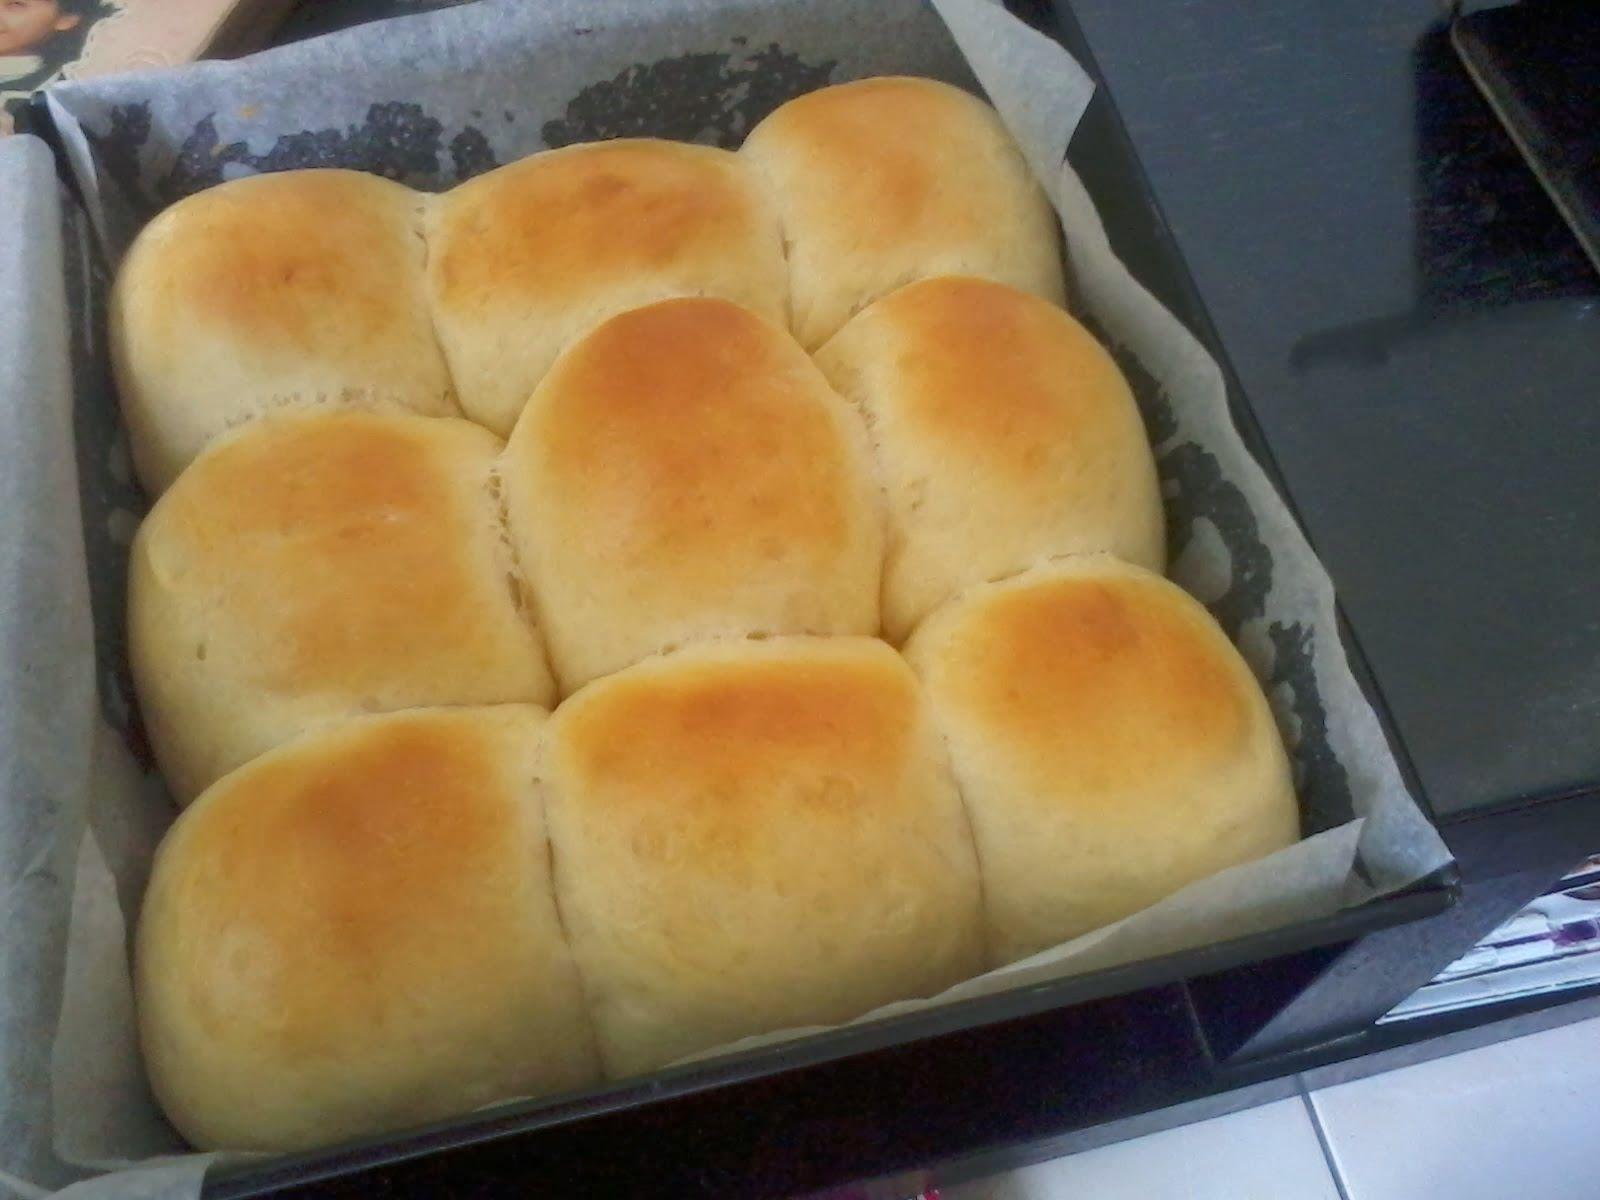 Resepi Buat Bun Simple Dan Mudah Kerja Kosong Terkini Rotis Aneka Roti Pembuat Roti